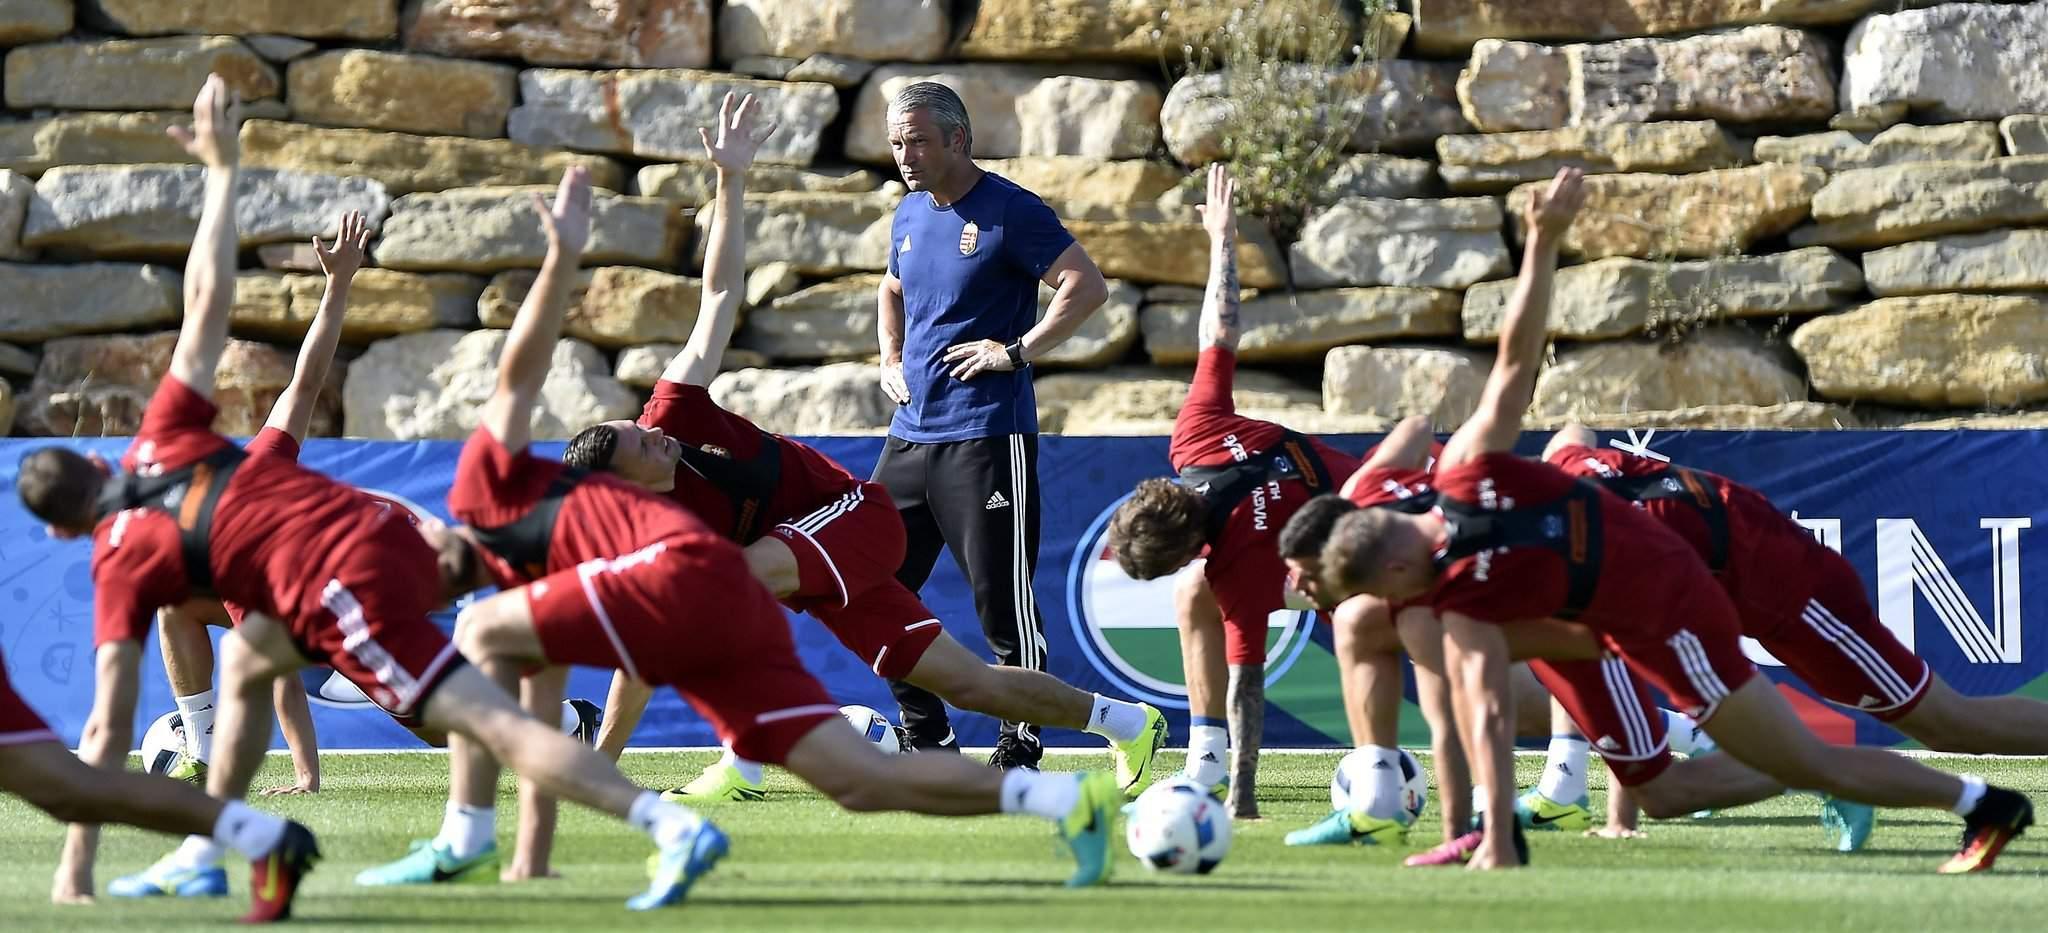 Bernd Storck announces 18-man squad for training camp